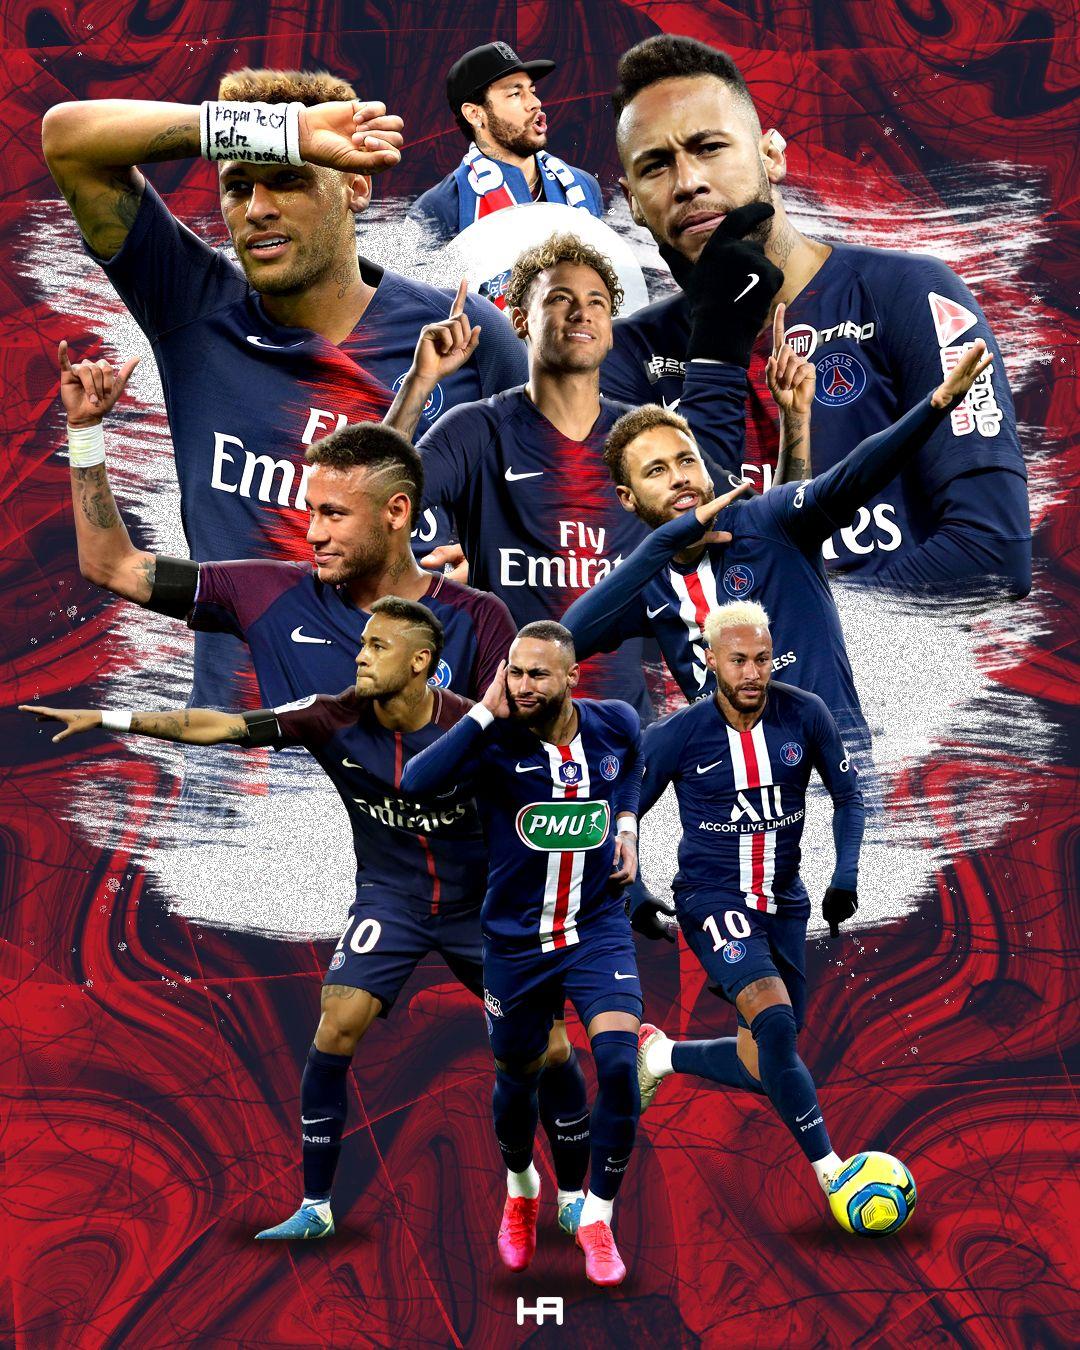 Neymar Paris Saint Germain In 2020 Neymar Football Football Poster Neymar Jr Wallpapers